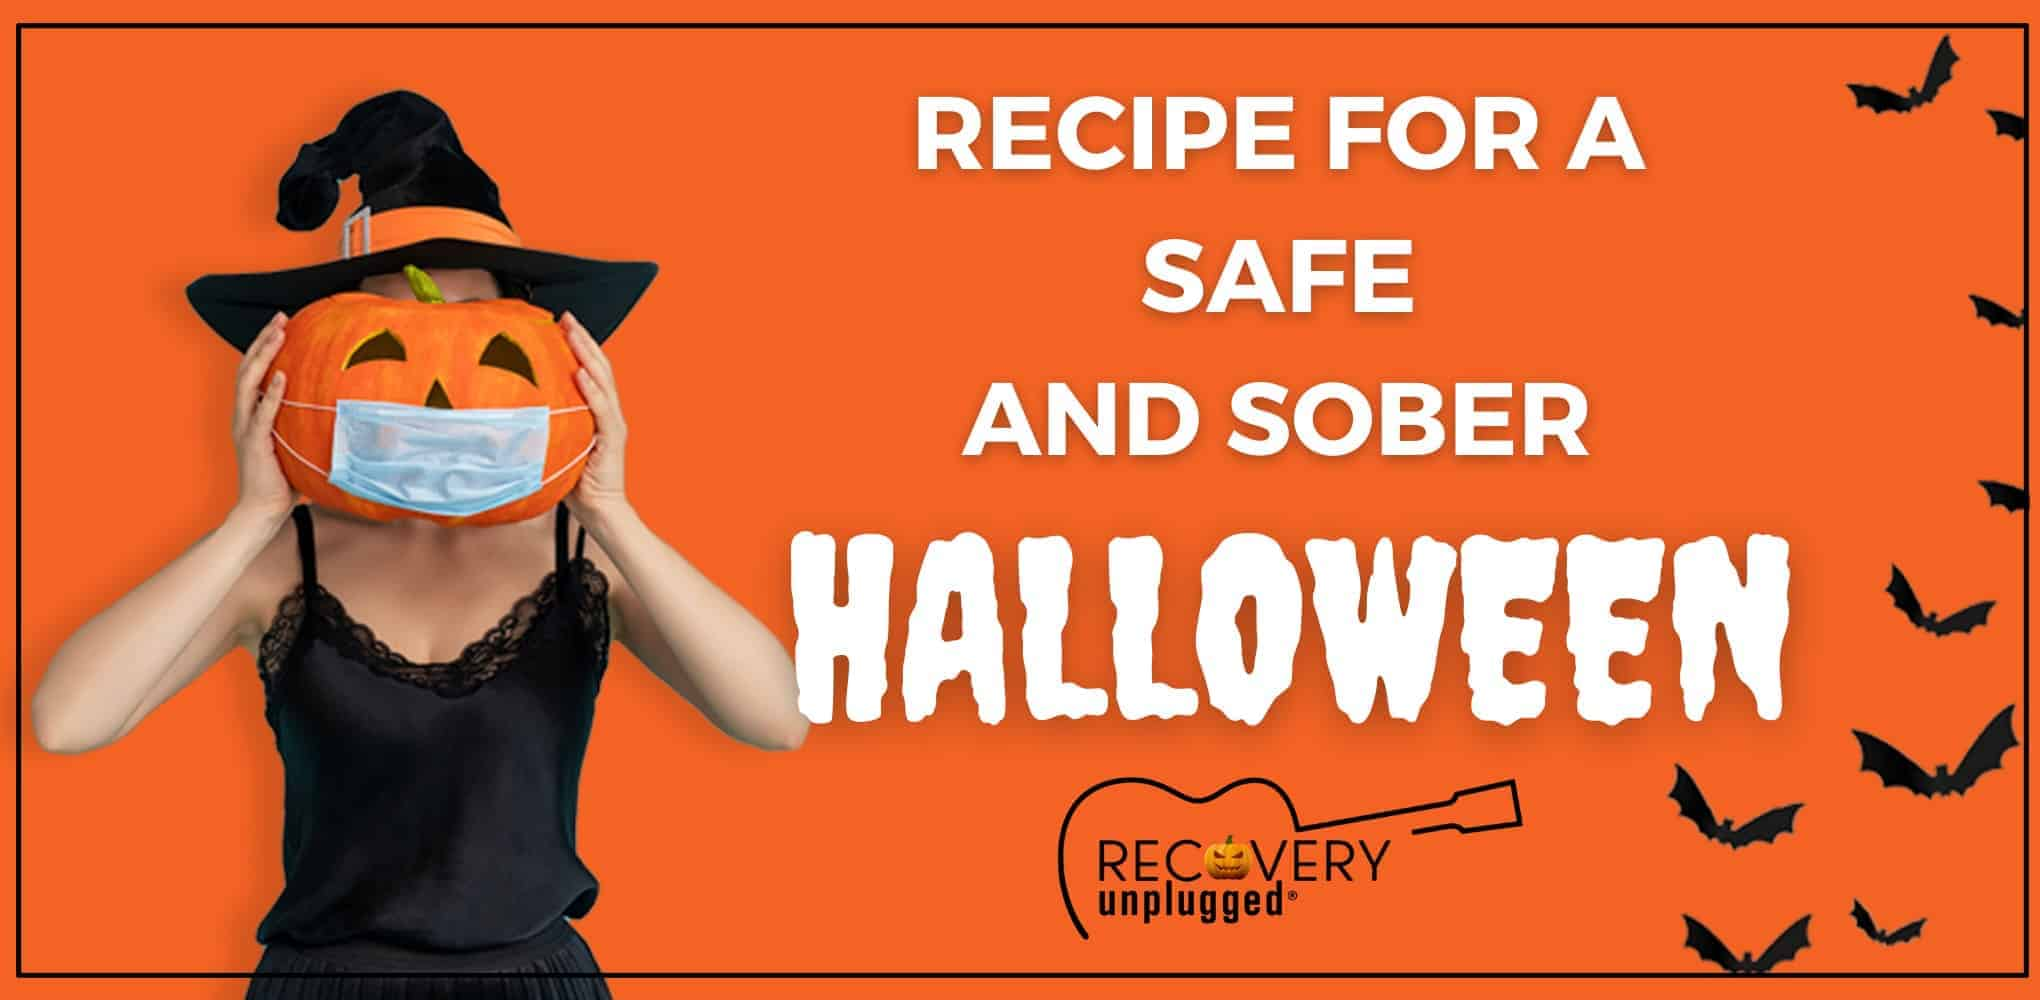 Sober Halloween Tips